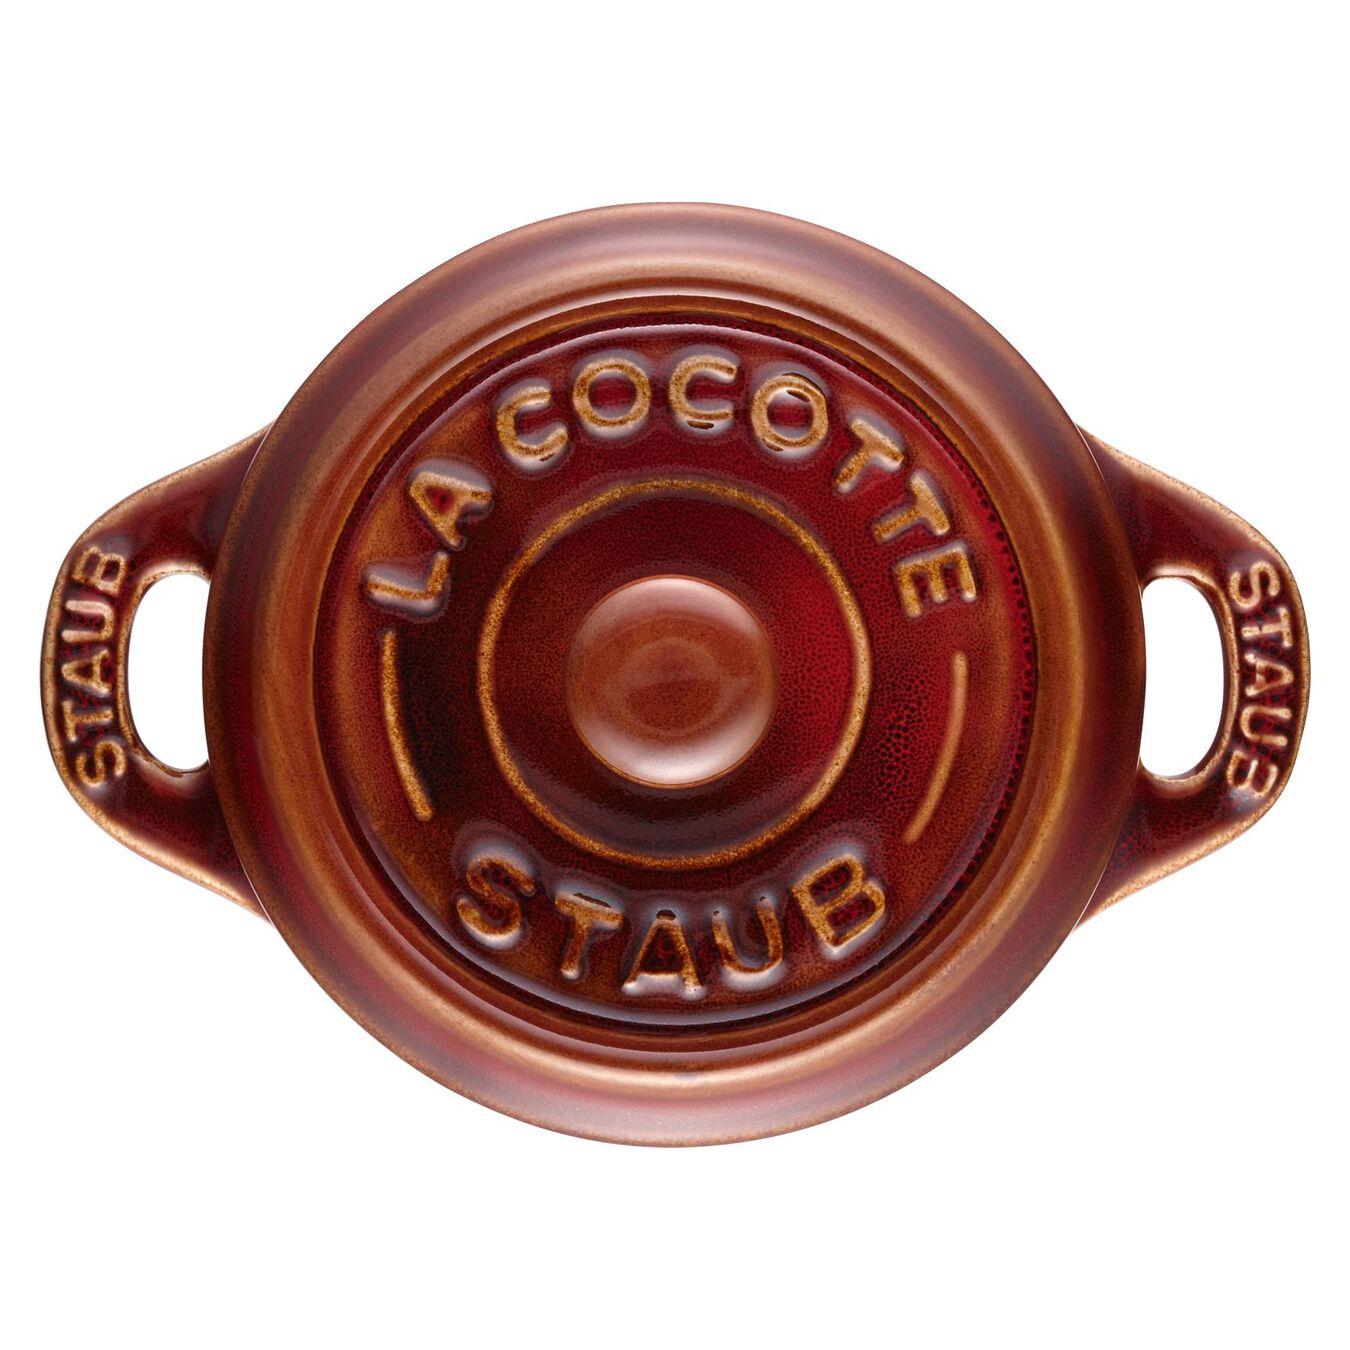 Mini cocotte rotonda - 10 cm, rame antico,,large 5